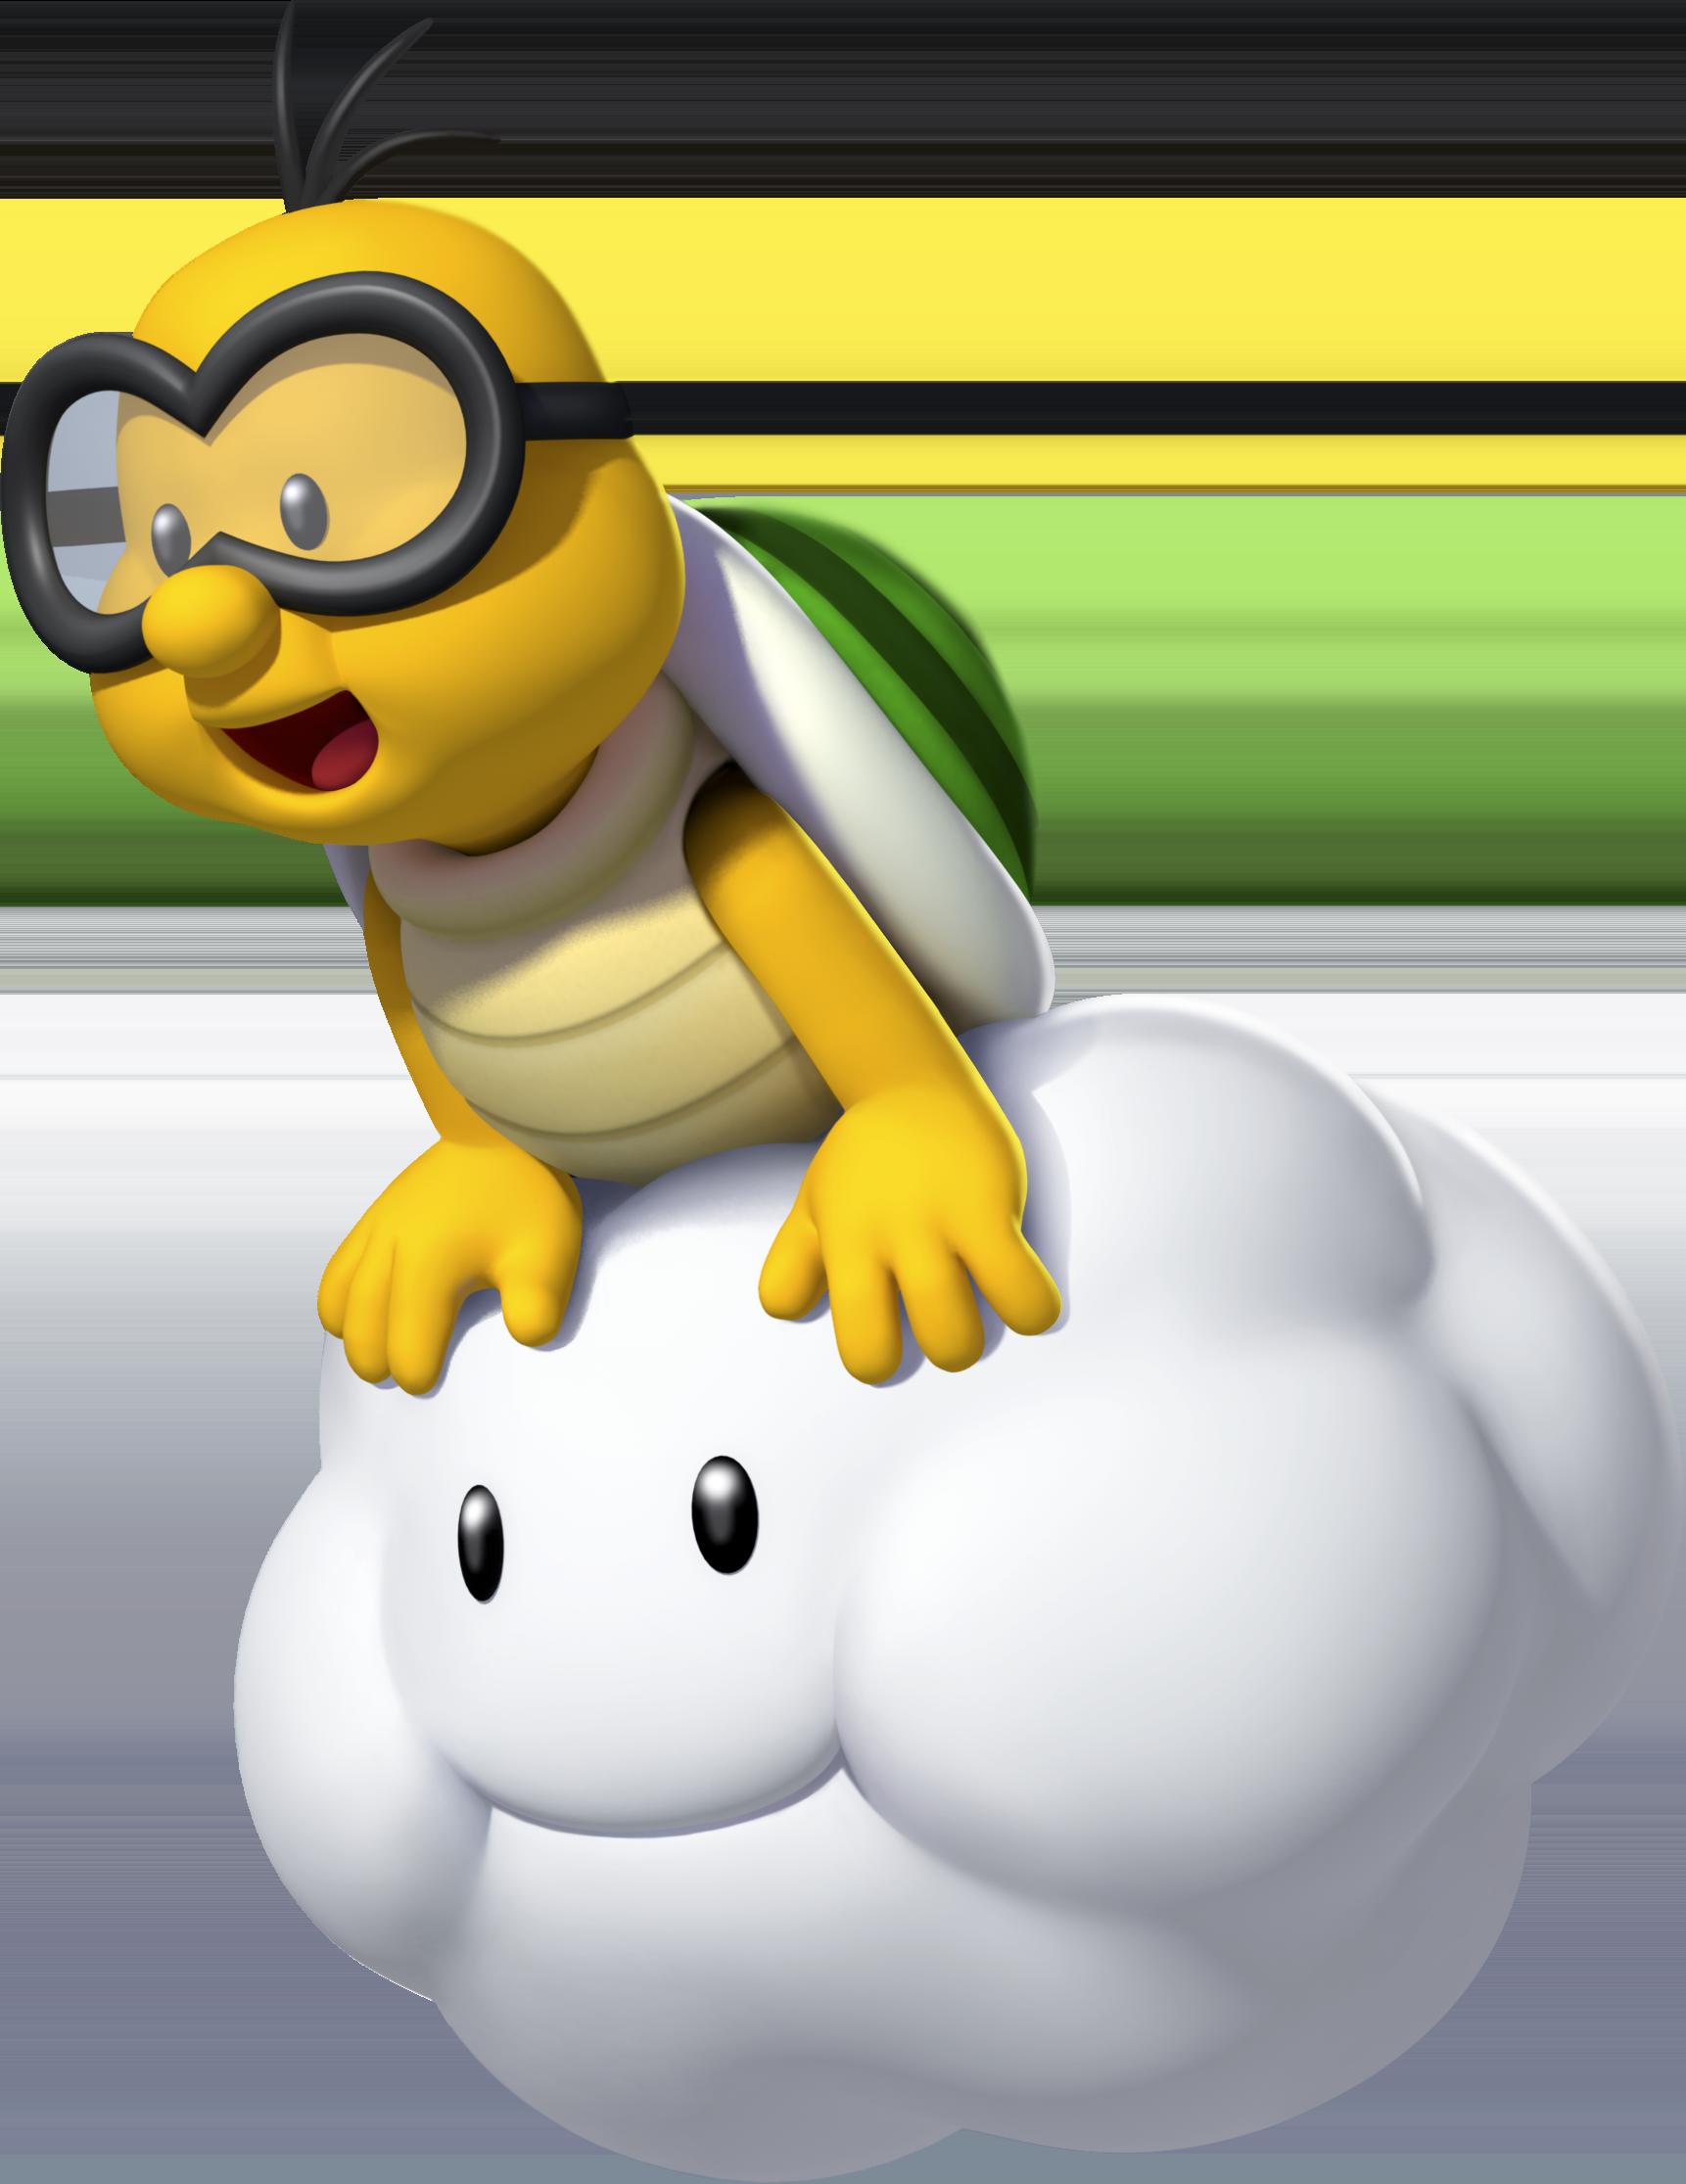 Cloud clipart mario bros. Lakitu kaizo maker wikia